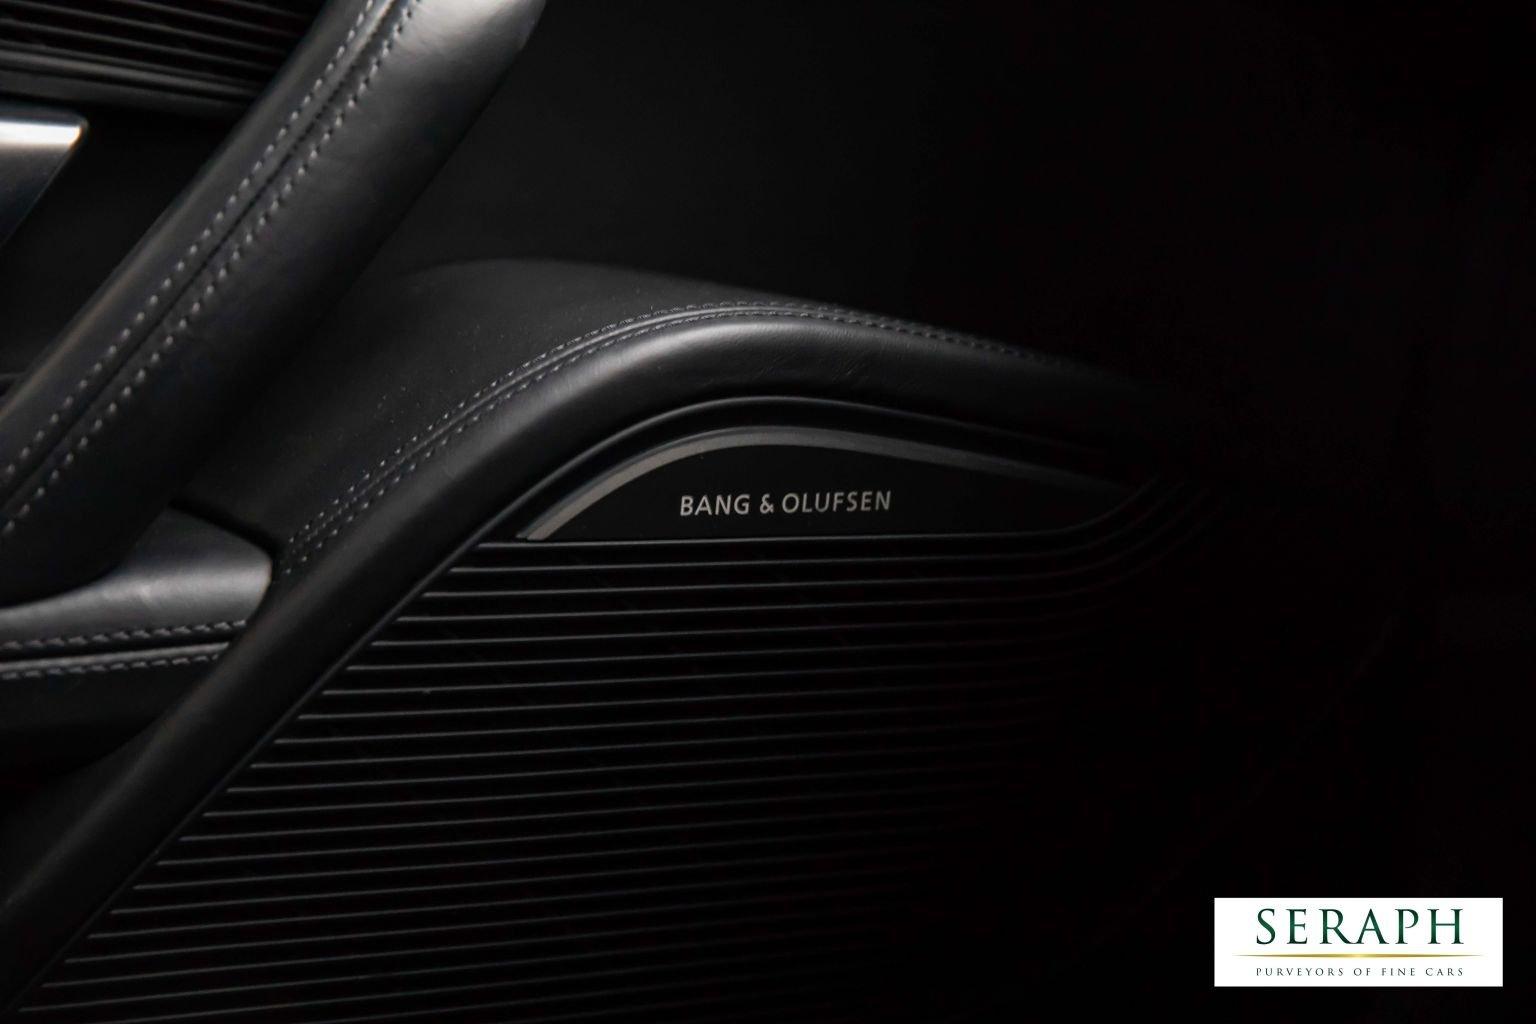 Audi R8 5.2 FSI V10 CoD Plus S Tronic quattro 2dr Coupe